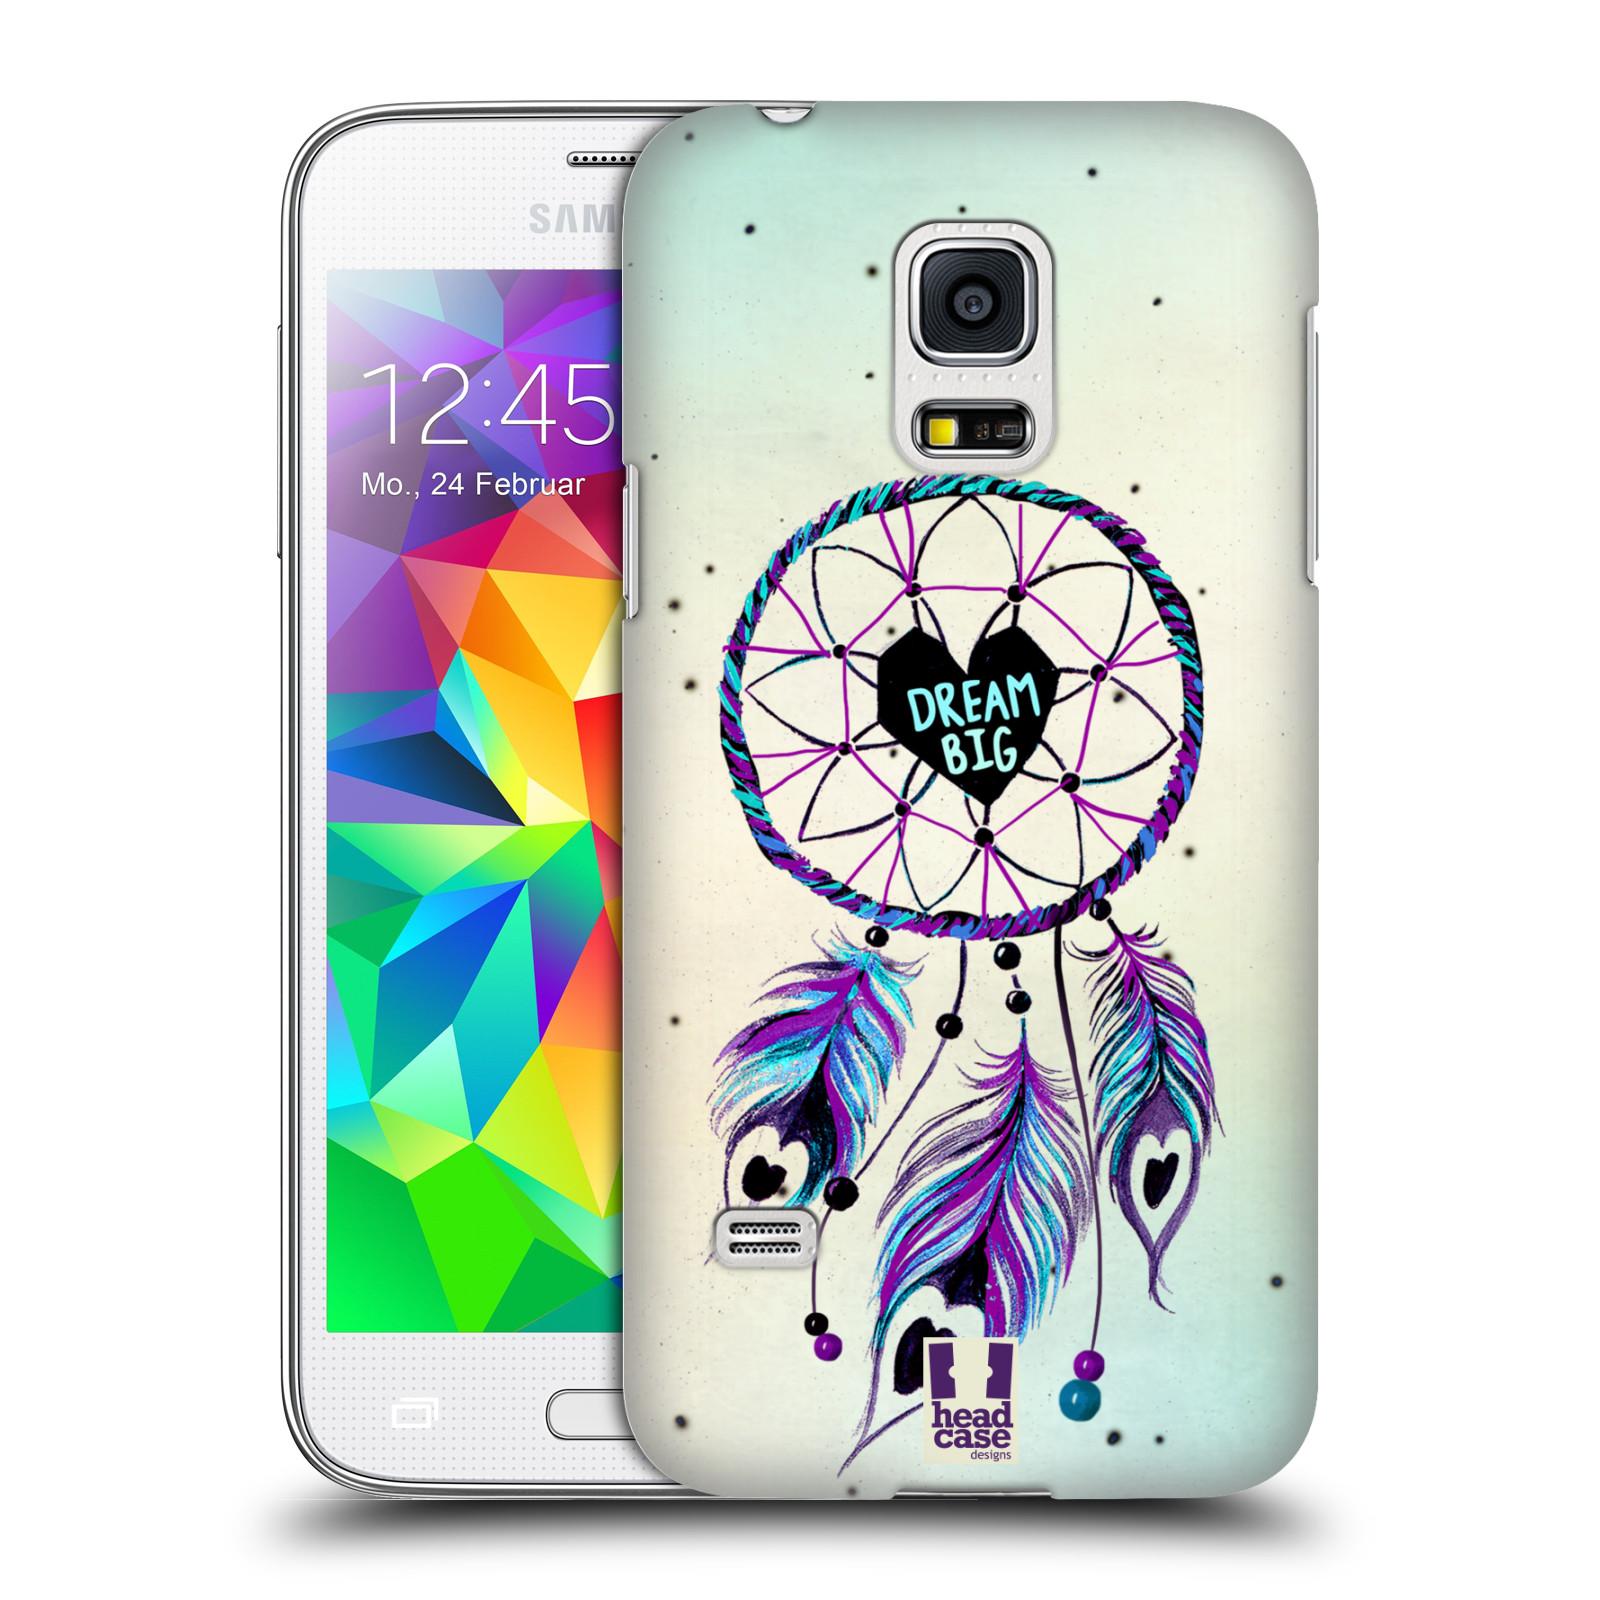 5162f8738 Plastové pouzdro na mobil Samsung Galaxy S5 Mini HEAD CASE Lapač Assorted  Dream Big Srdce (